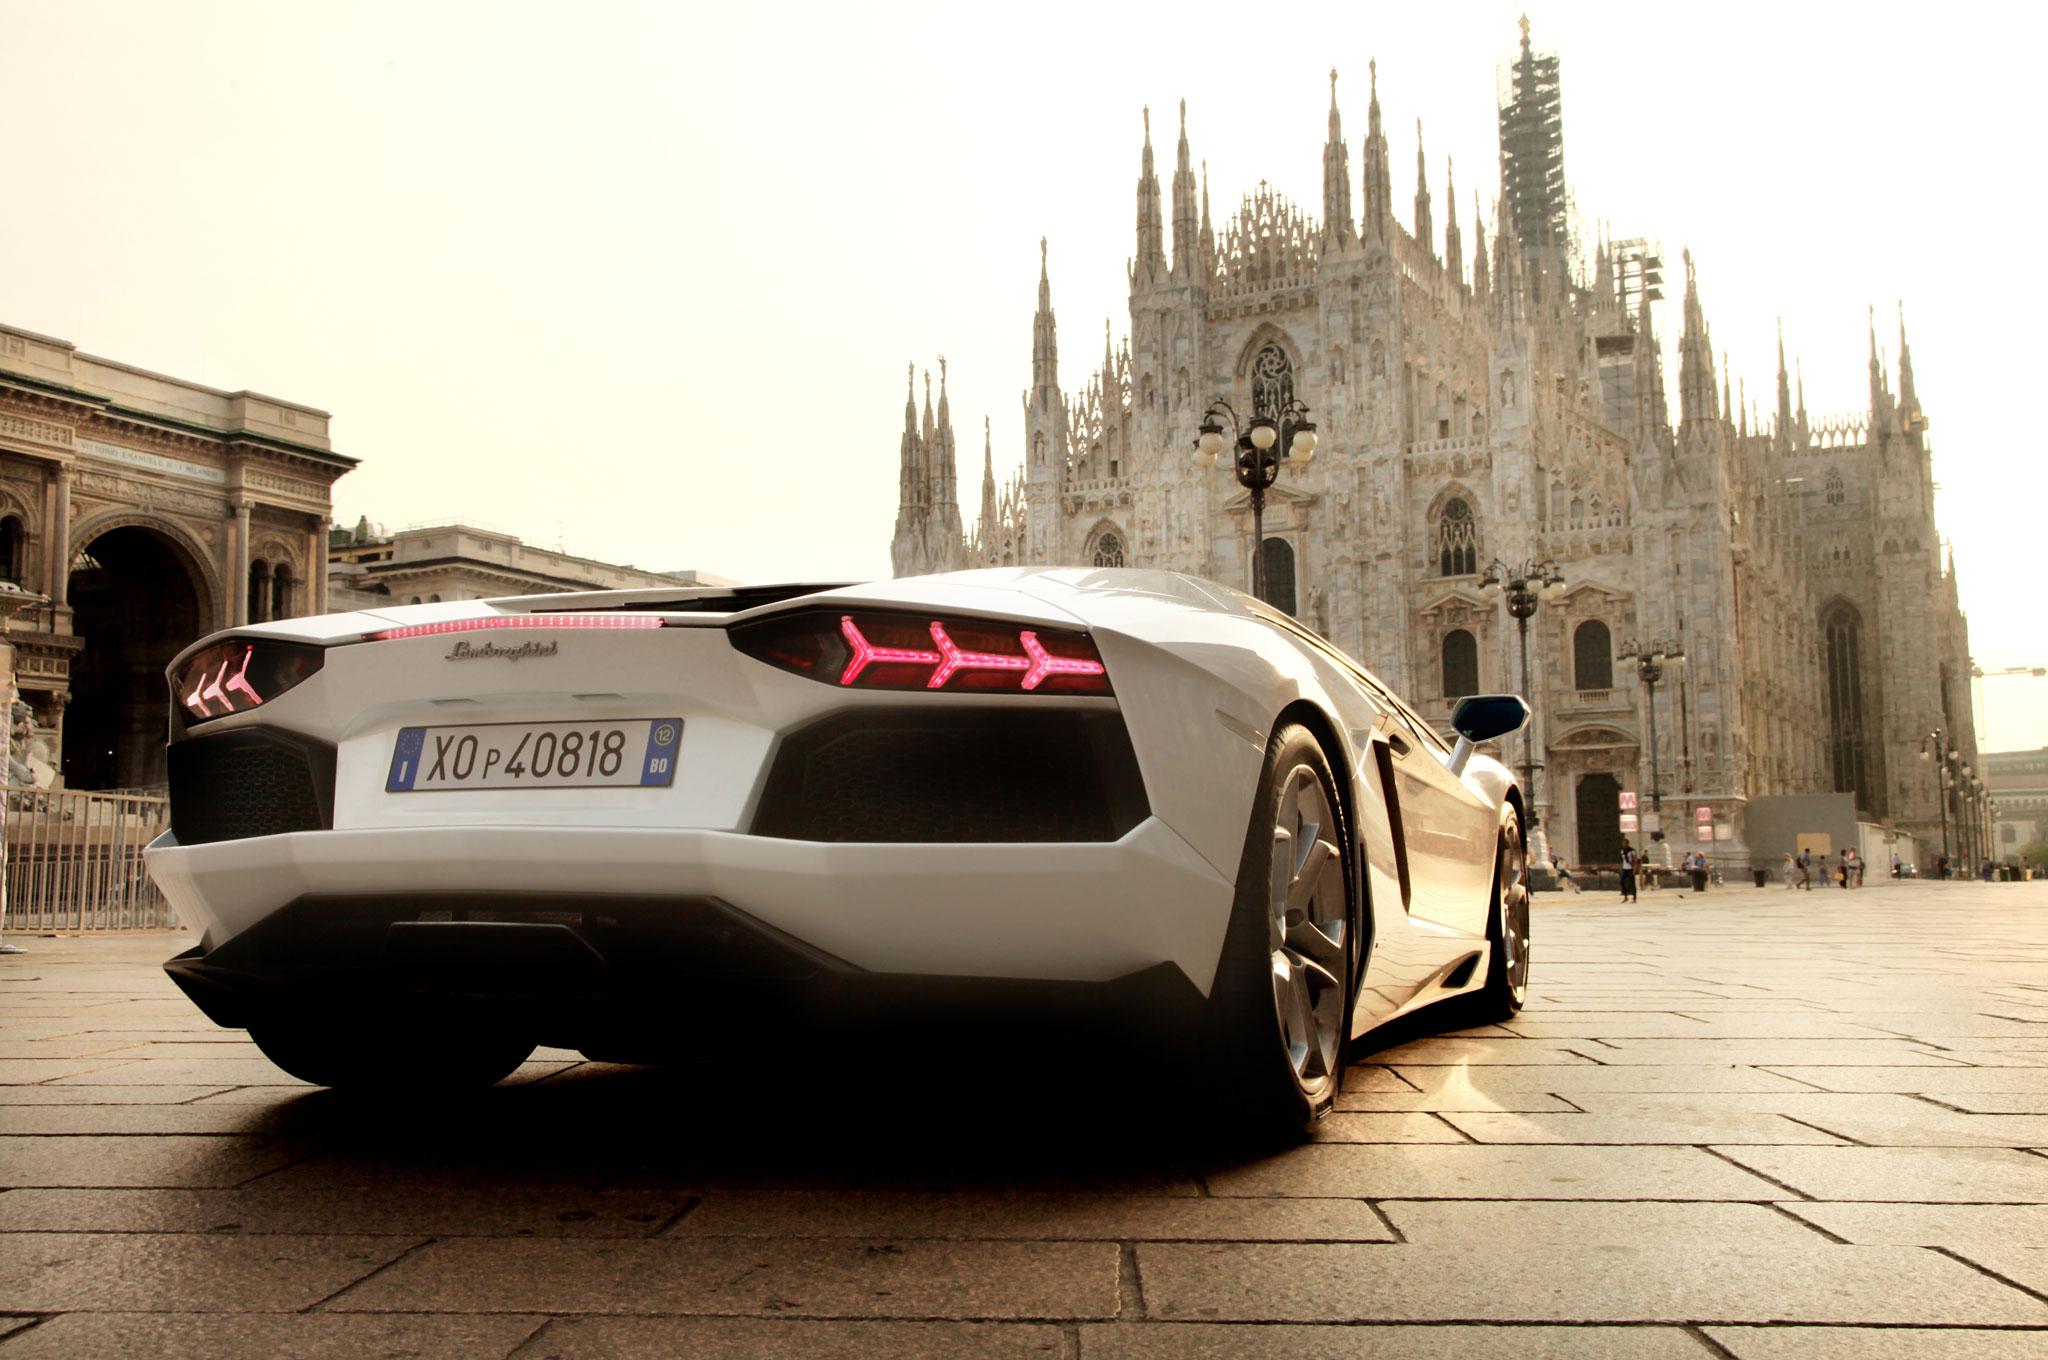 Lamborghini Aventador And Milan Cathedral1